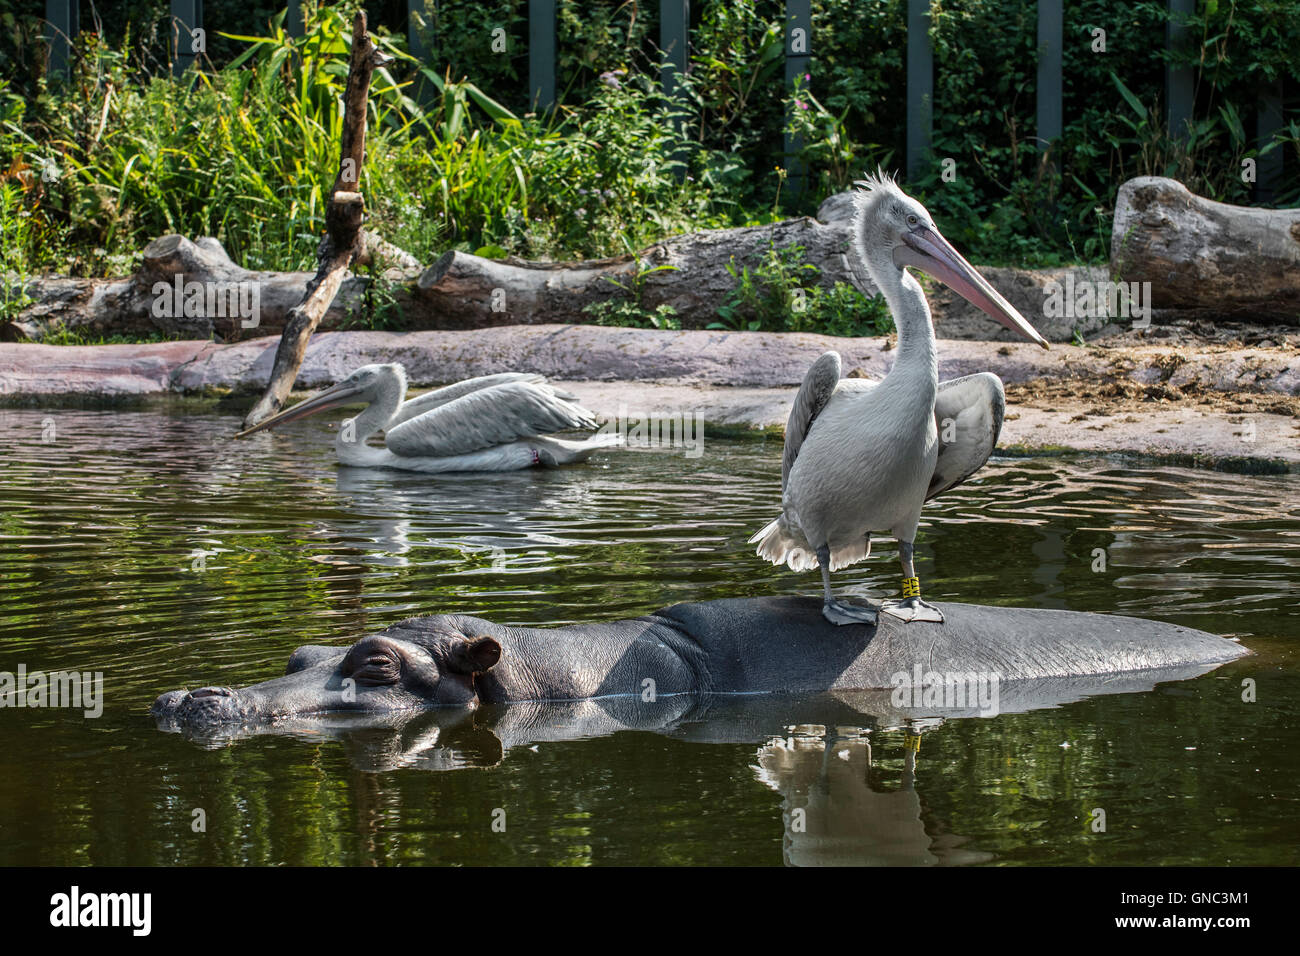 Dalmatian pelican (Pelecanus crispus) resting on hippopotamus (Hippopotamus amphibius) in pond at the Antwerp Zoo, - Stock Image